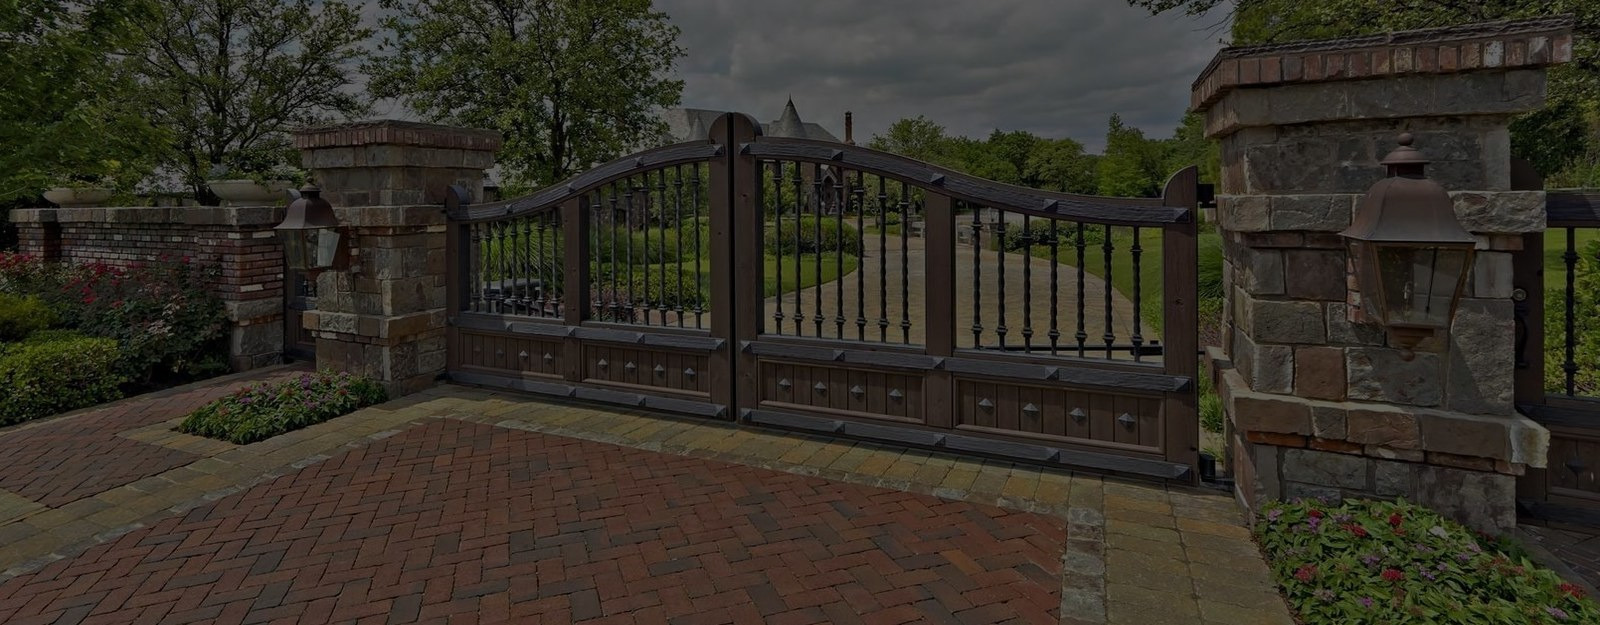 Automatic Gate Repair Bountiful